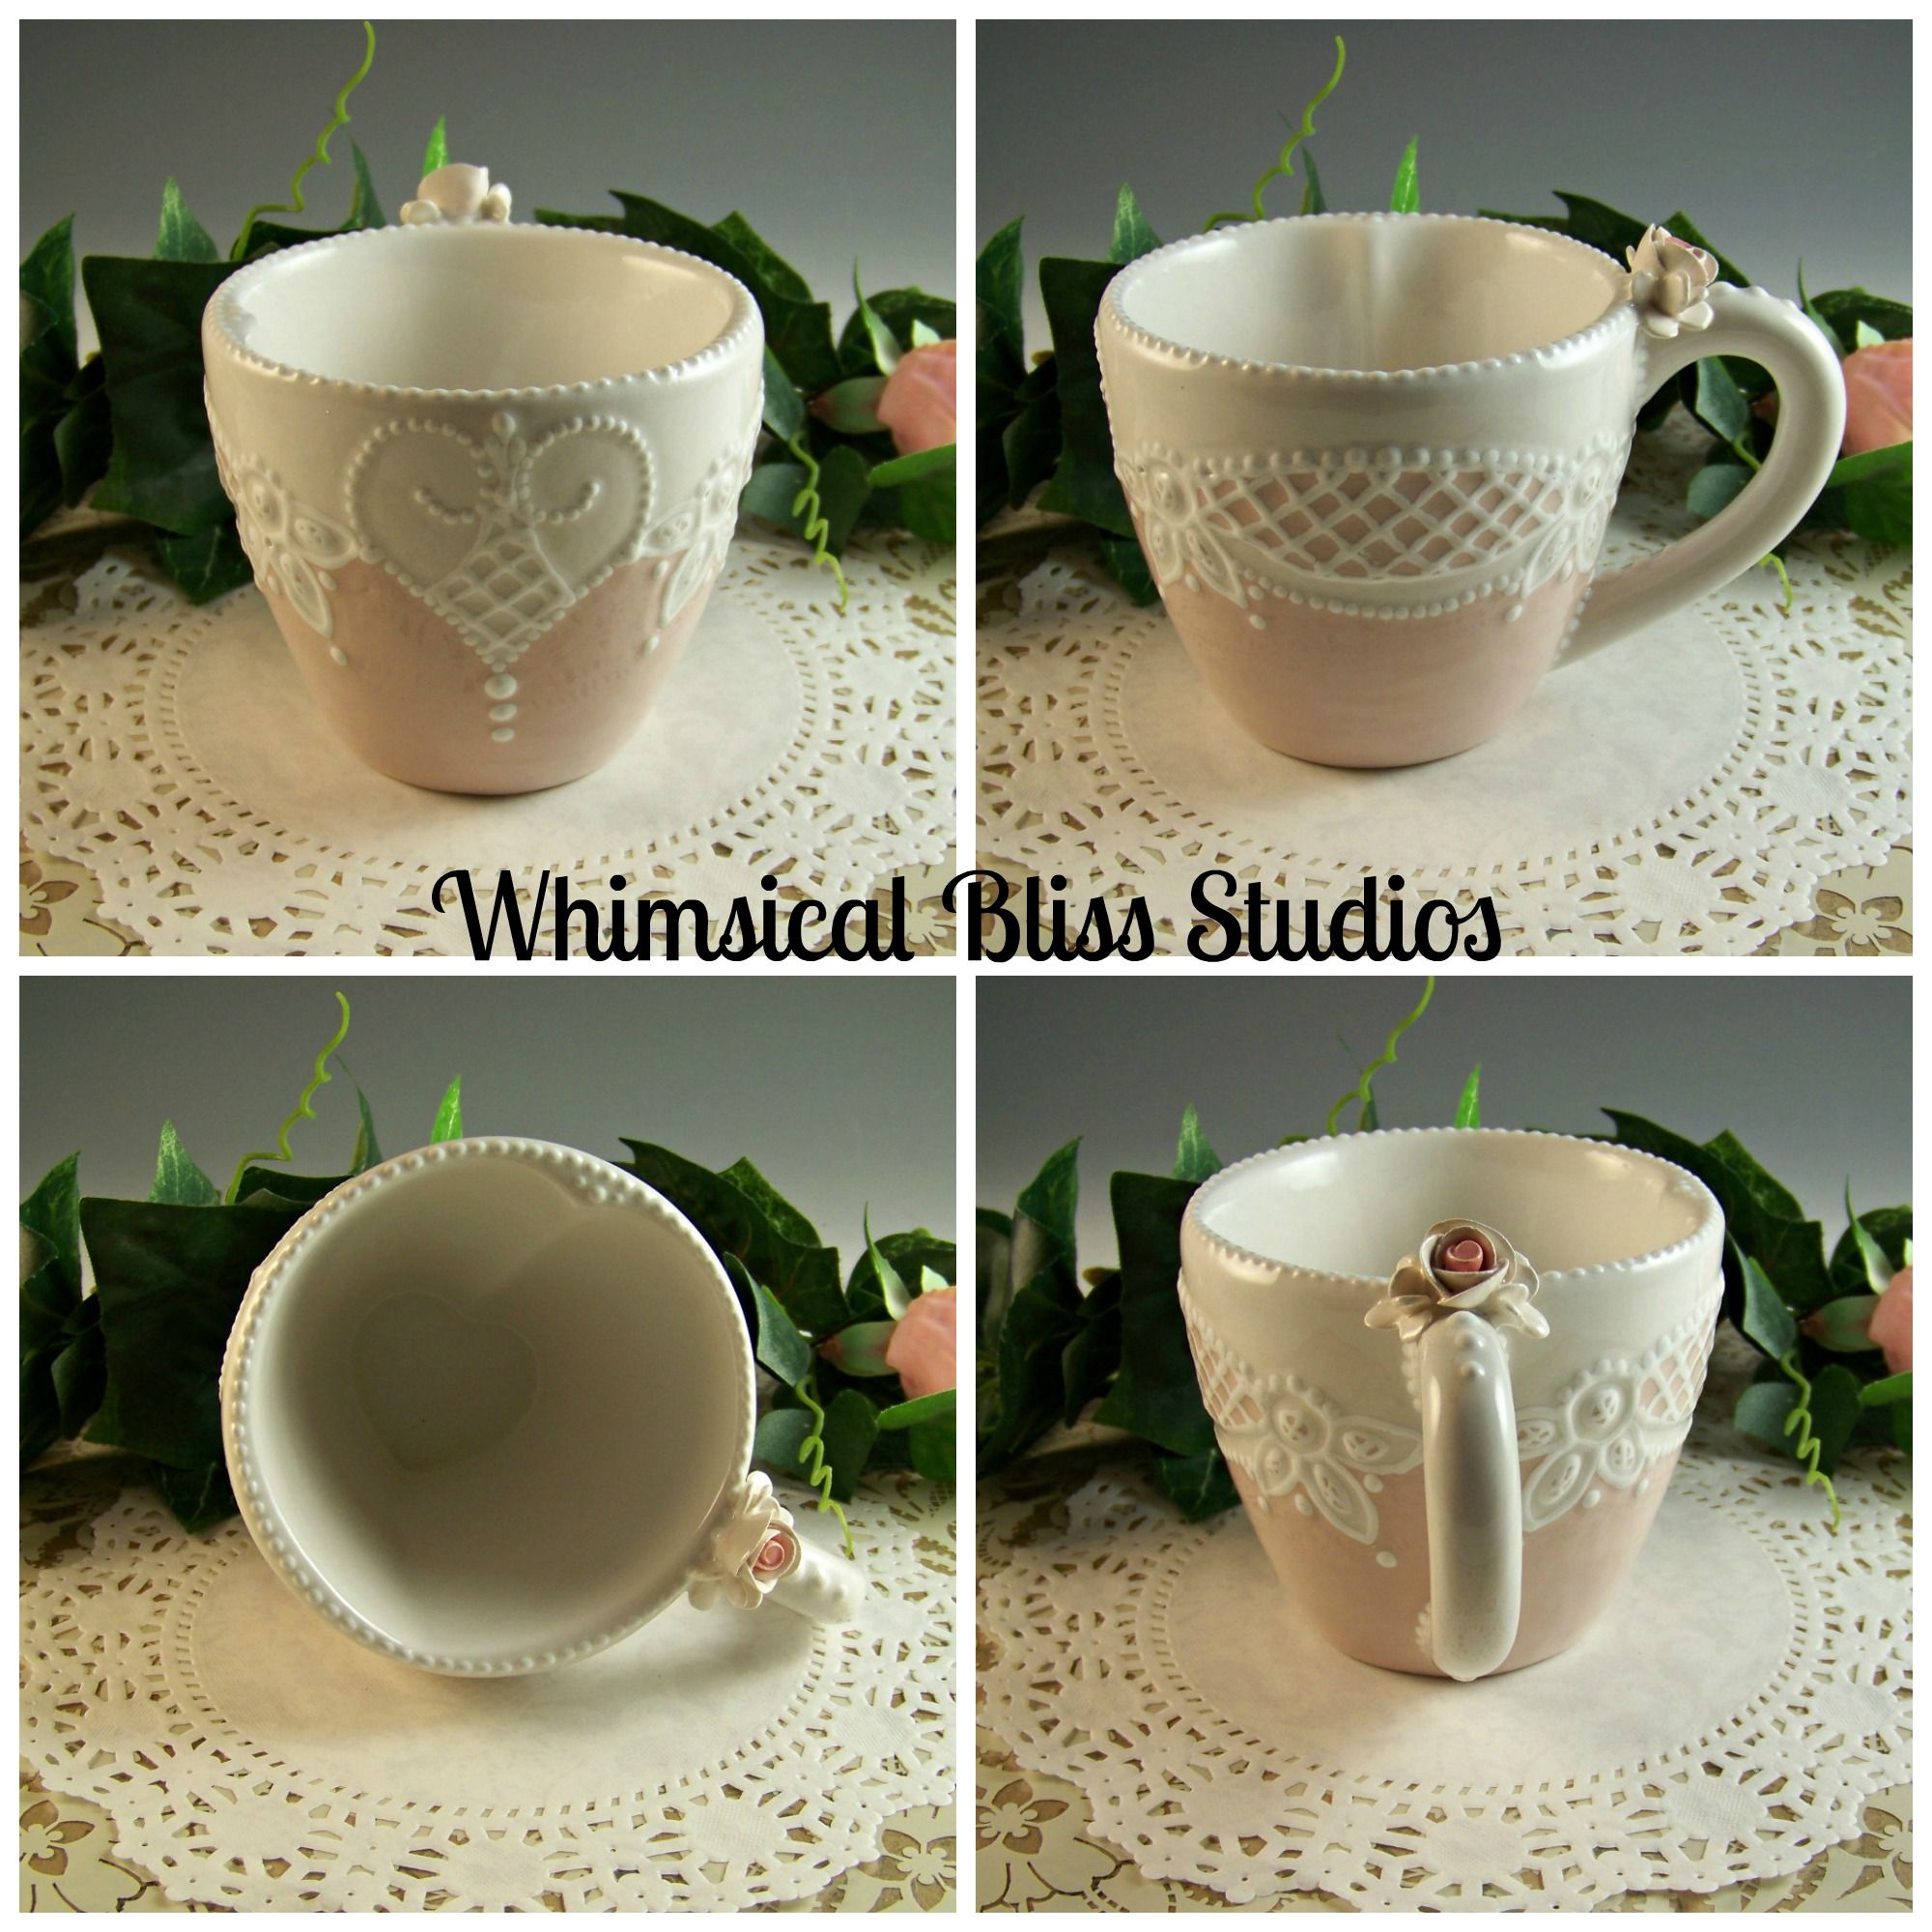 Whimsical Bliss Studios - Heart Peek-a-Boo Mug